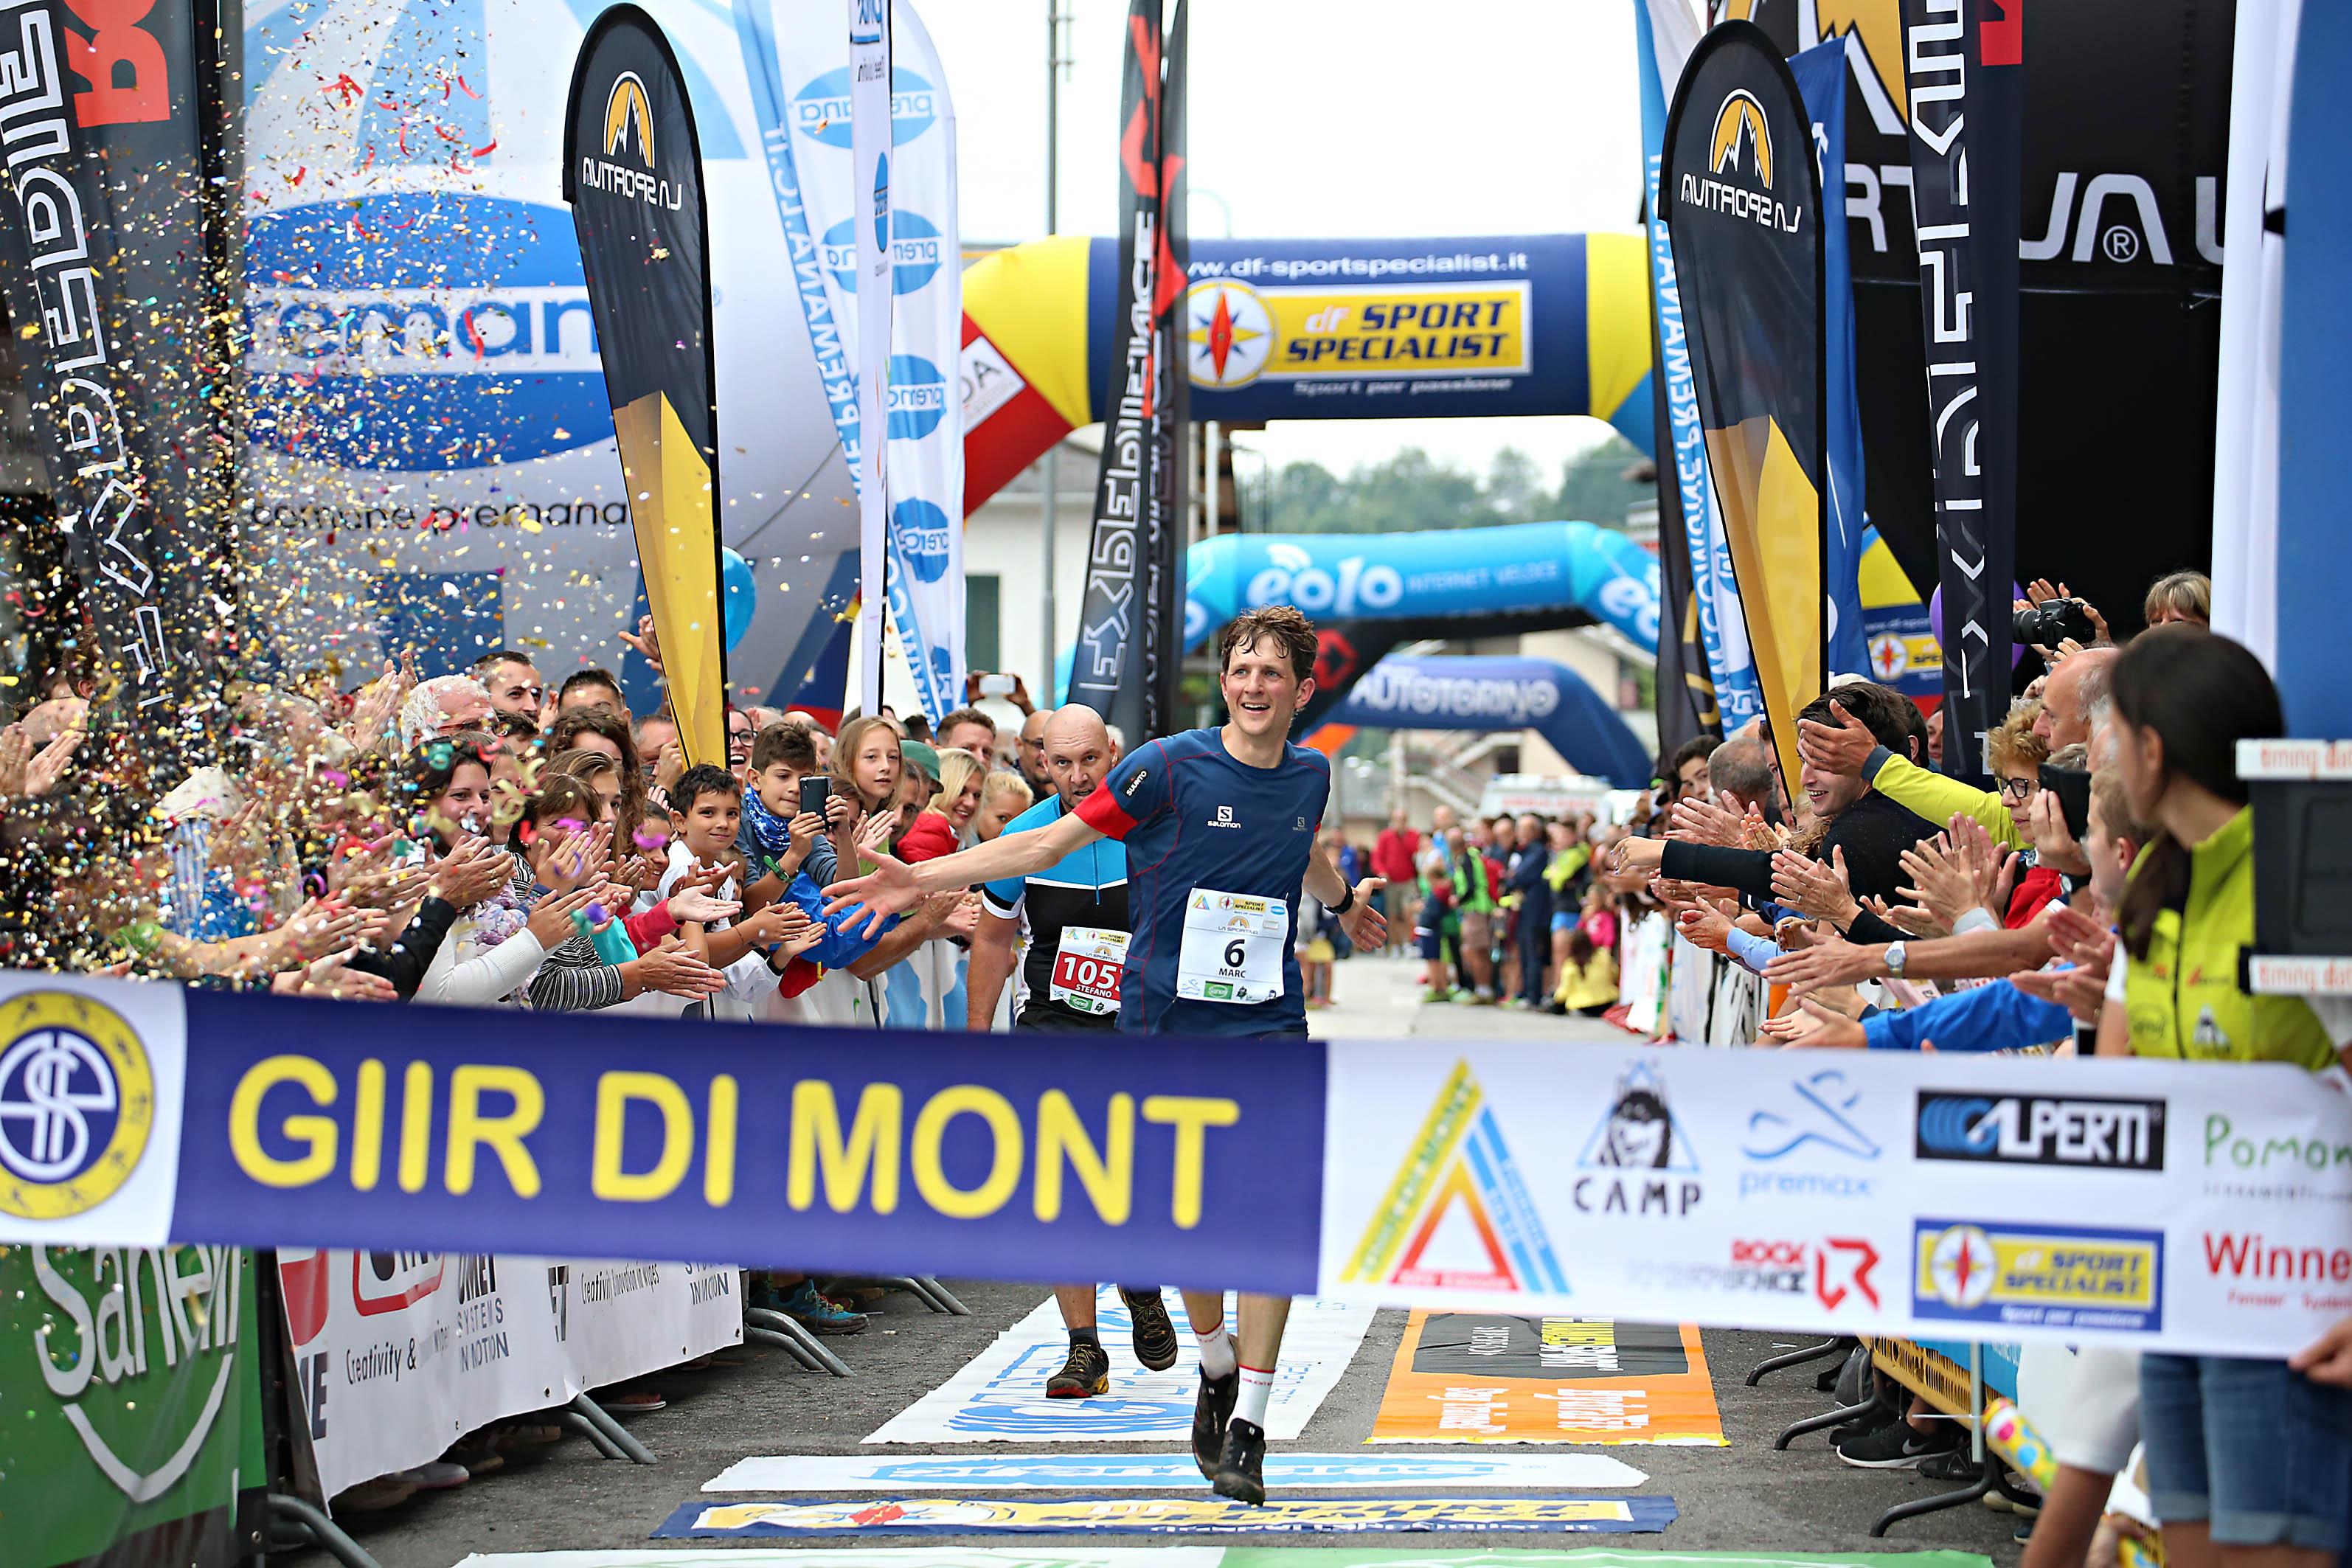 Mondiali 2017 di corsa in montagna e long distance a Premana